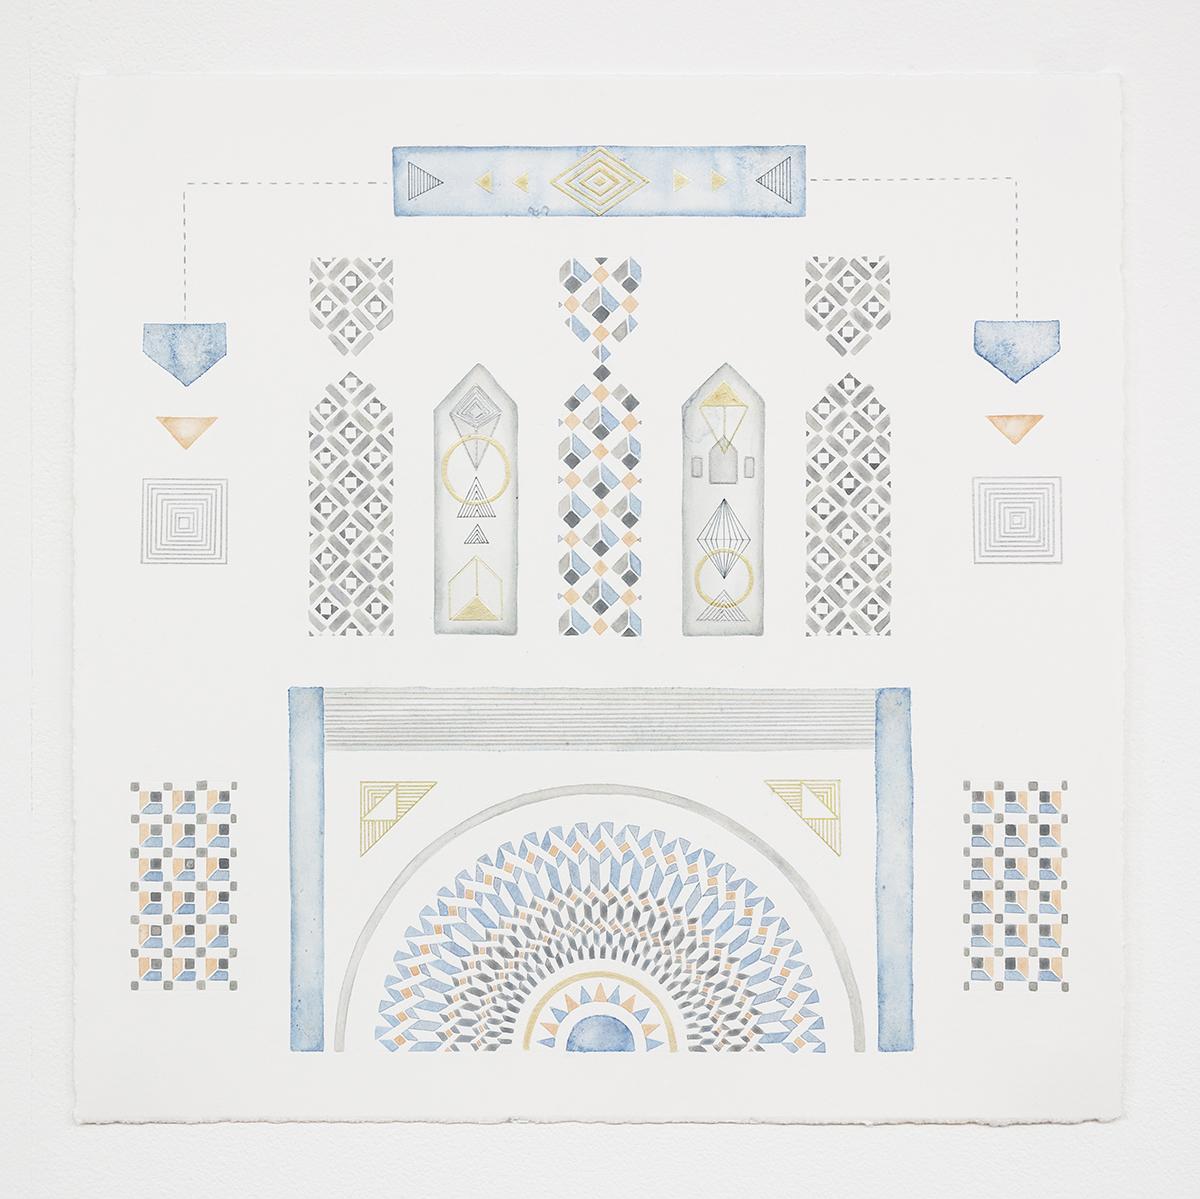 Entrance   acrylic, pen and colour pencil on paper, 40 x 40cm